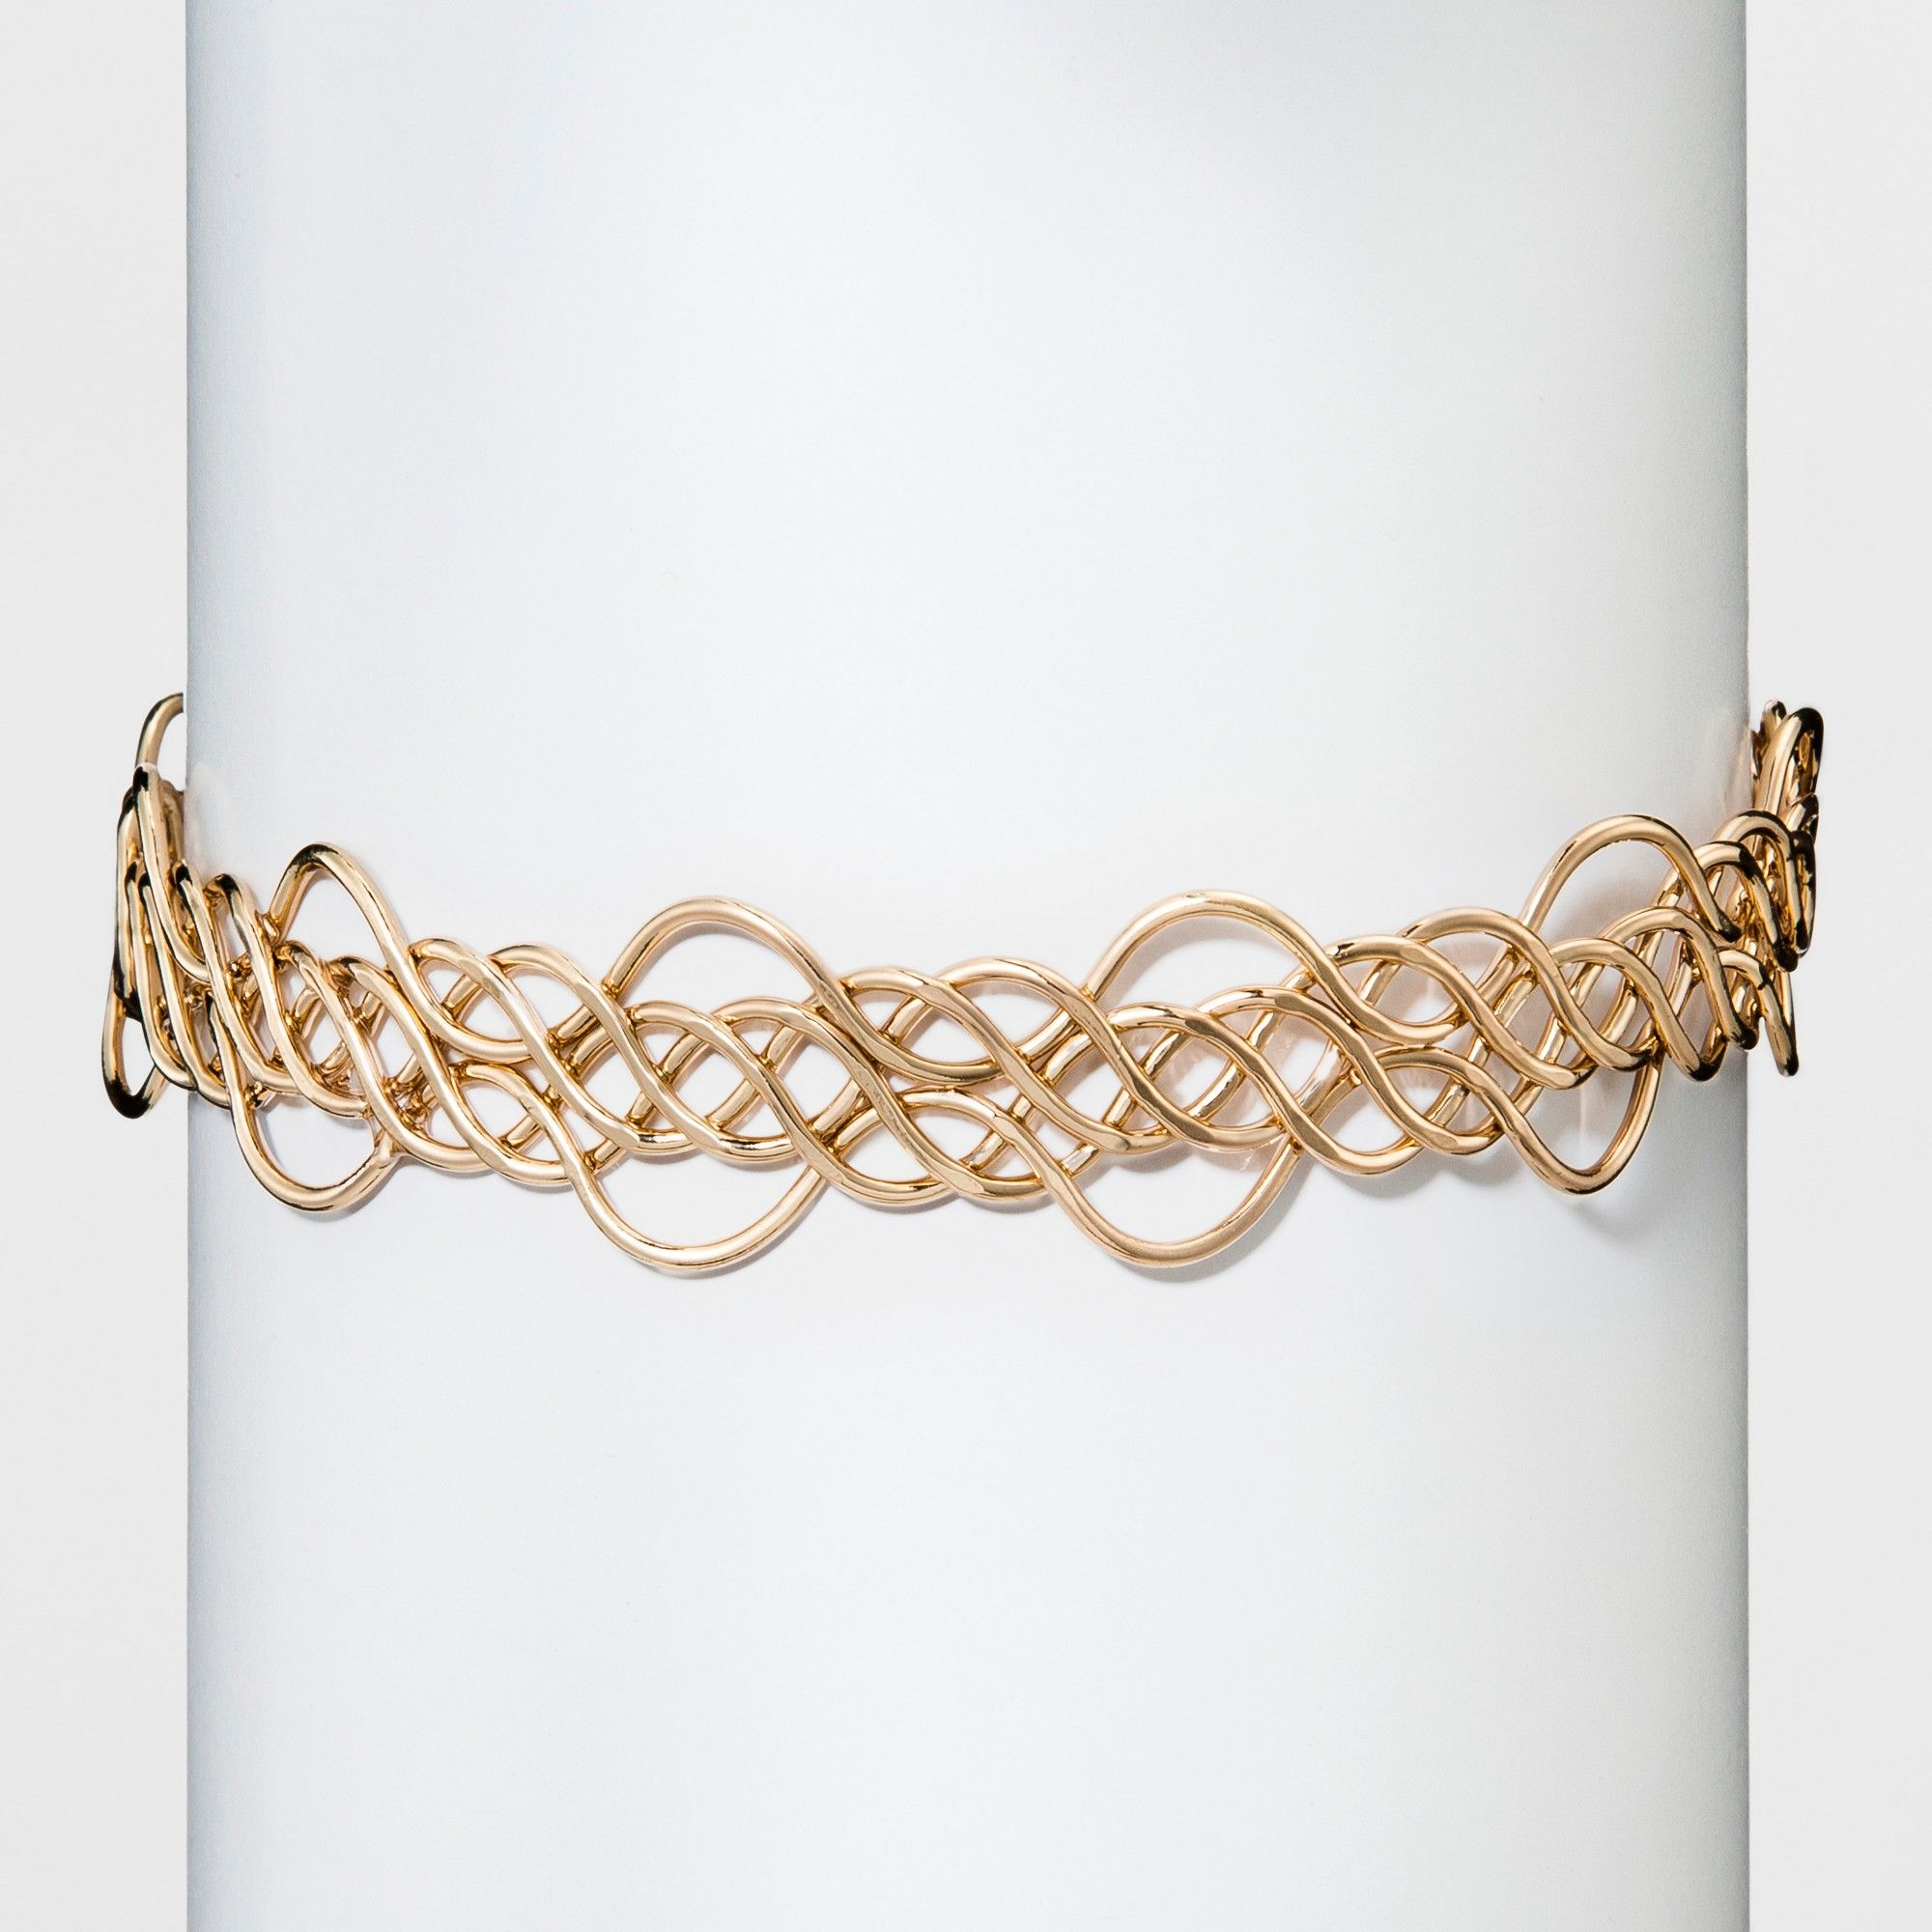 Womenus natasha accessories gold metal design choker gold